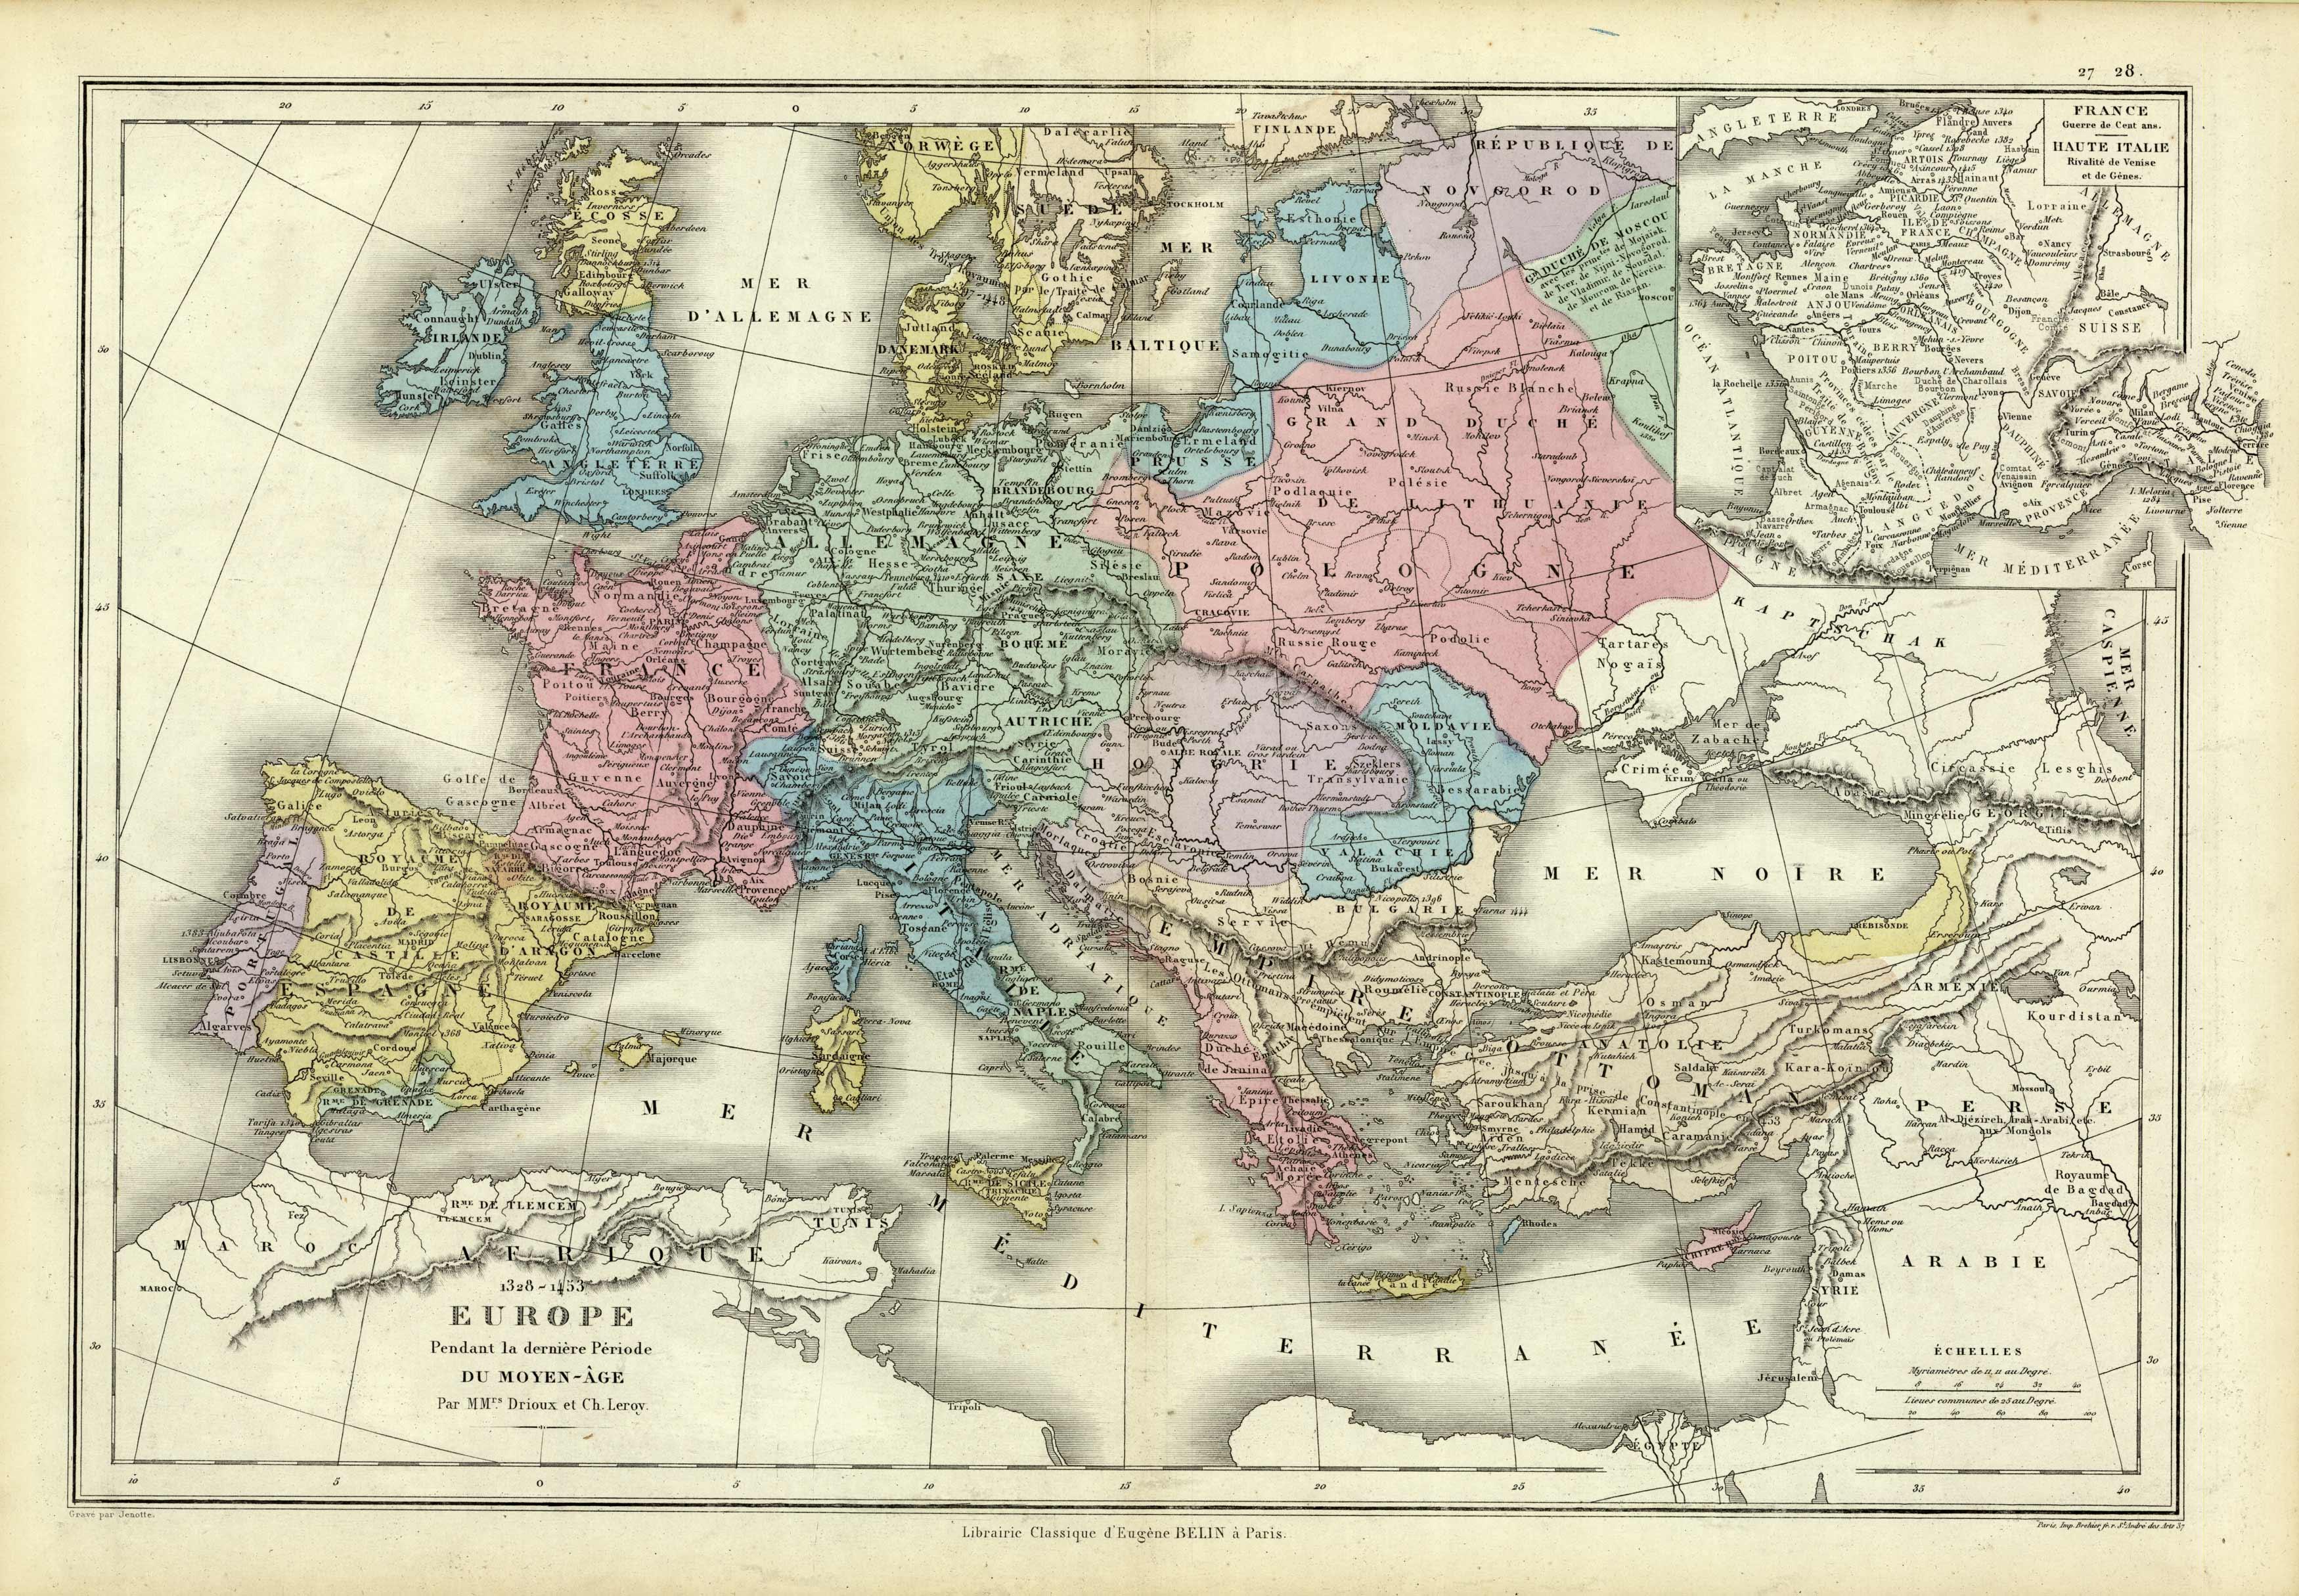 1328-1453 Europe du Moyan-Age